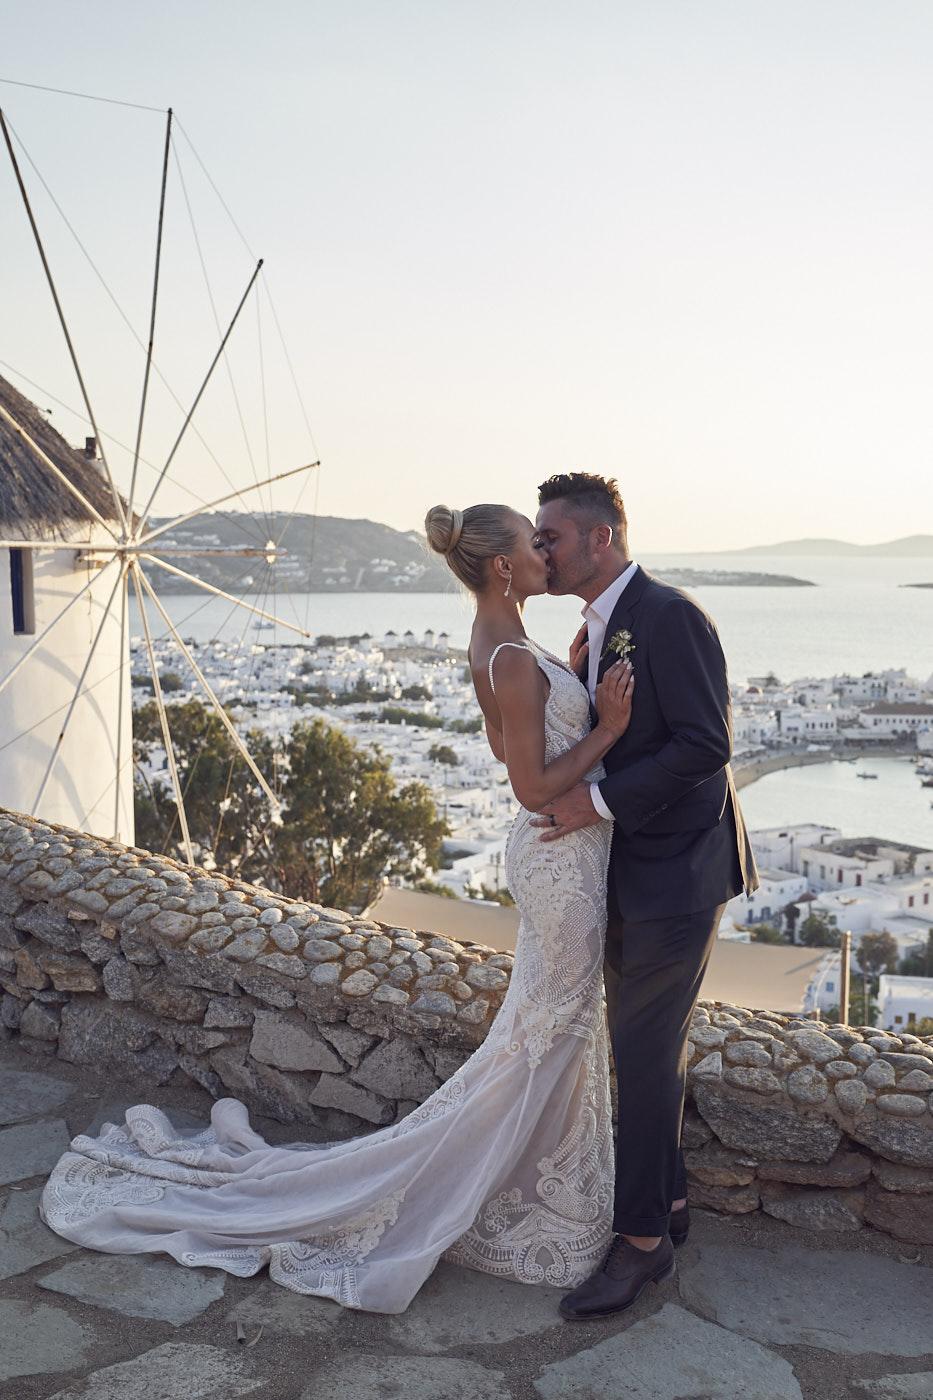 MandN_Mykonos-wedding_Lostinlove 8.JPG